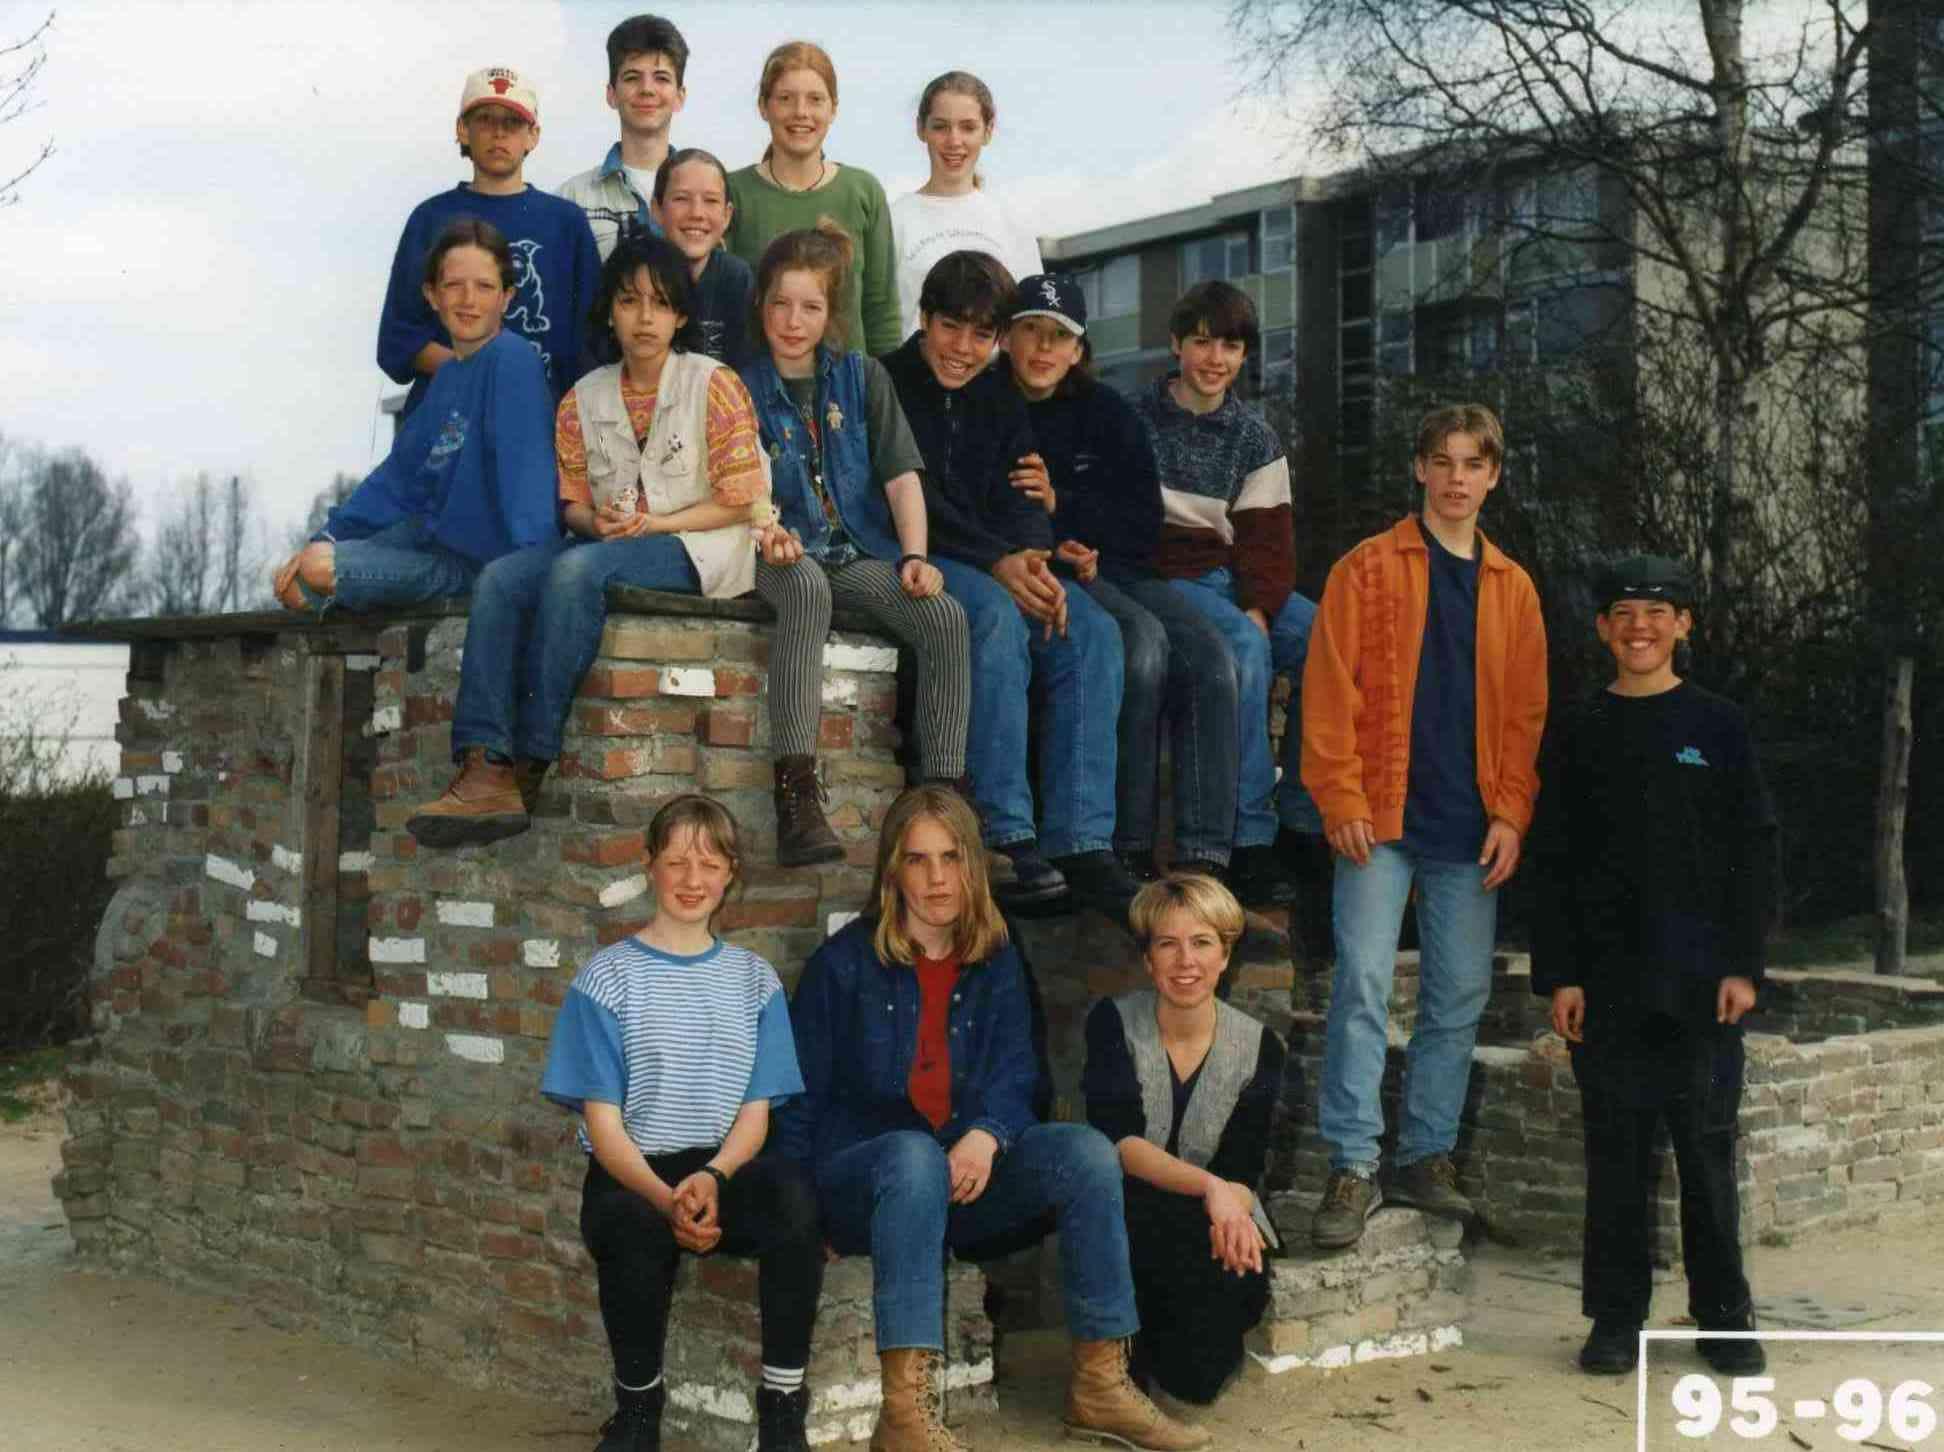 Rudolf Steinerschool Roosendaal foto